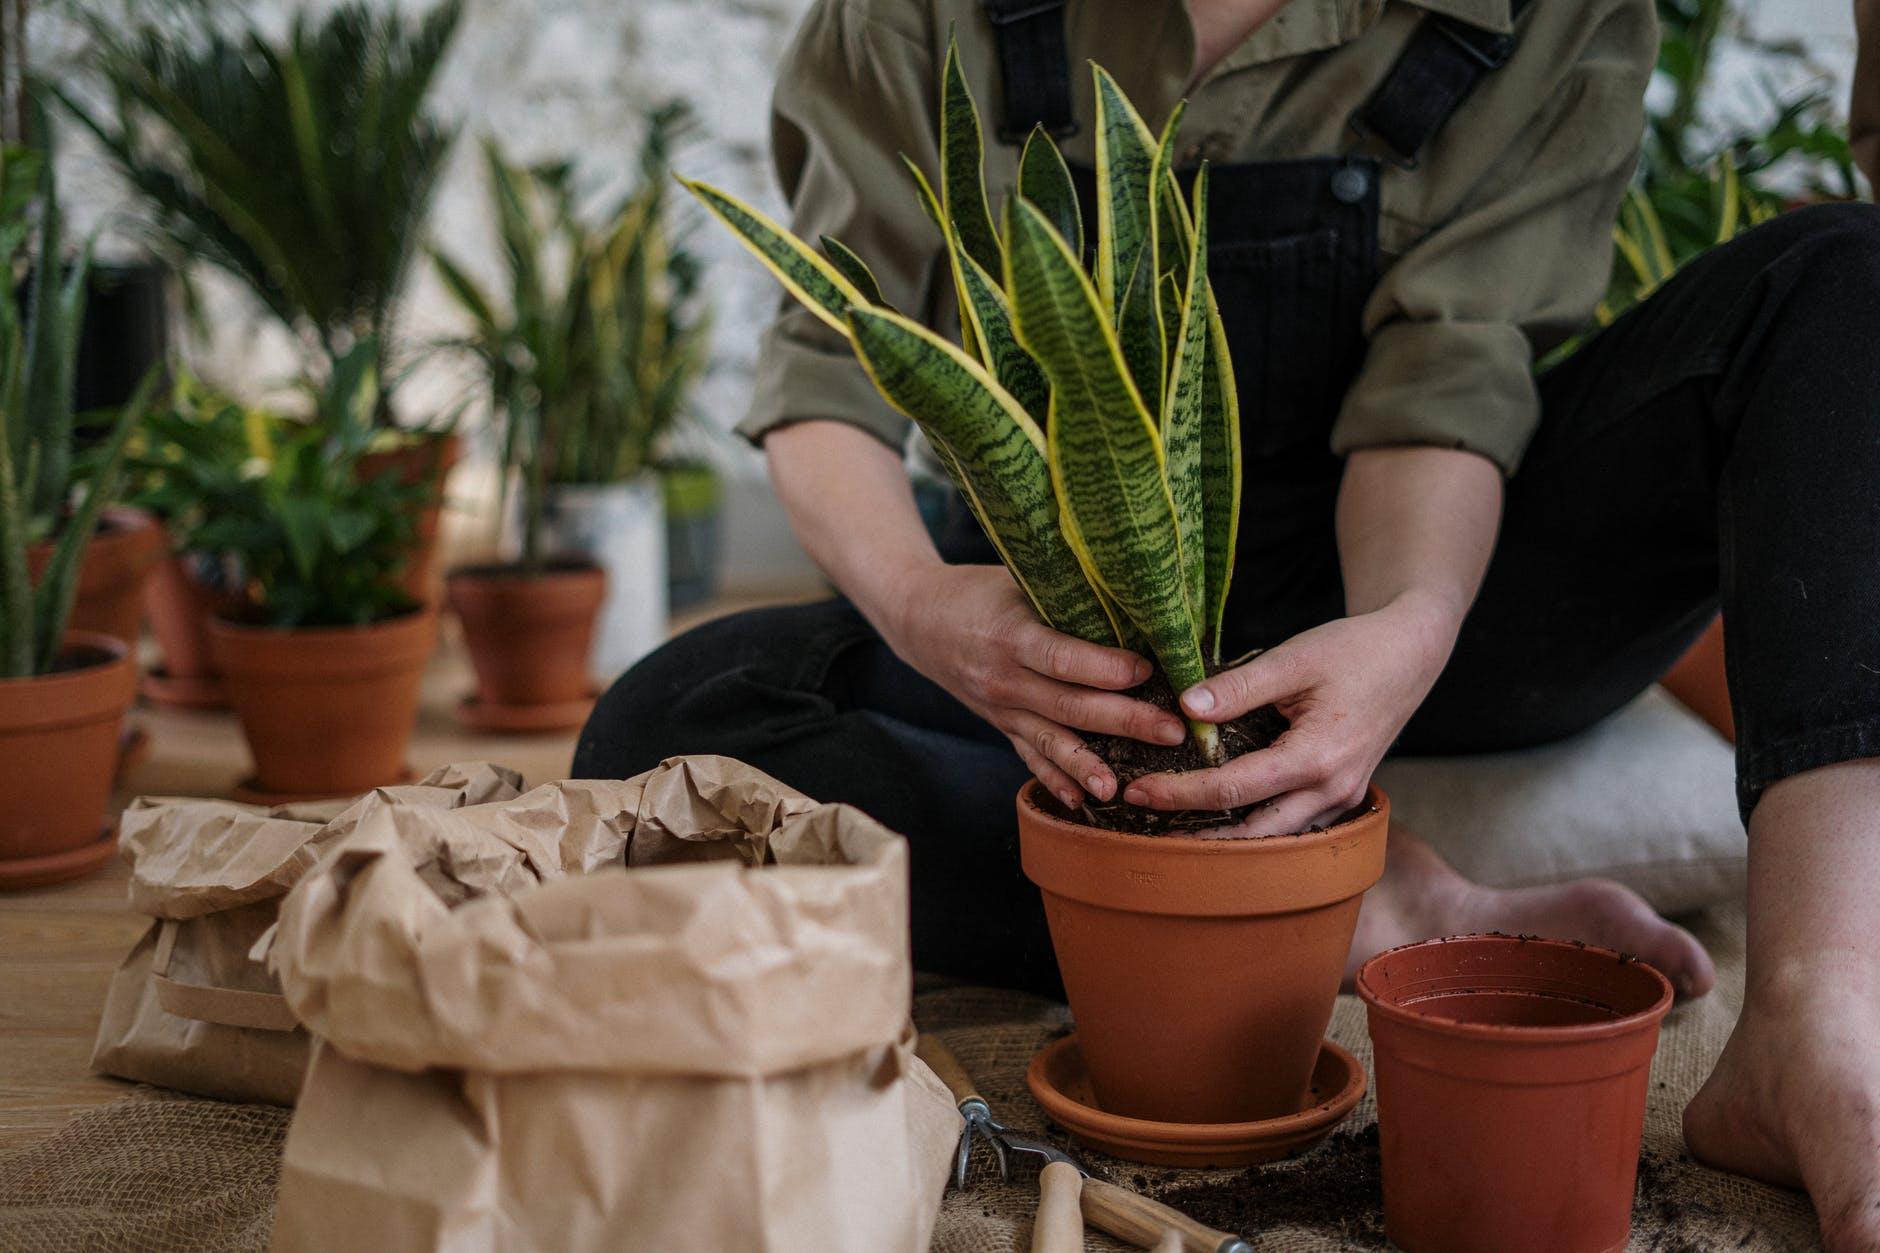 Woman planting a cactus.